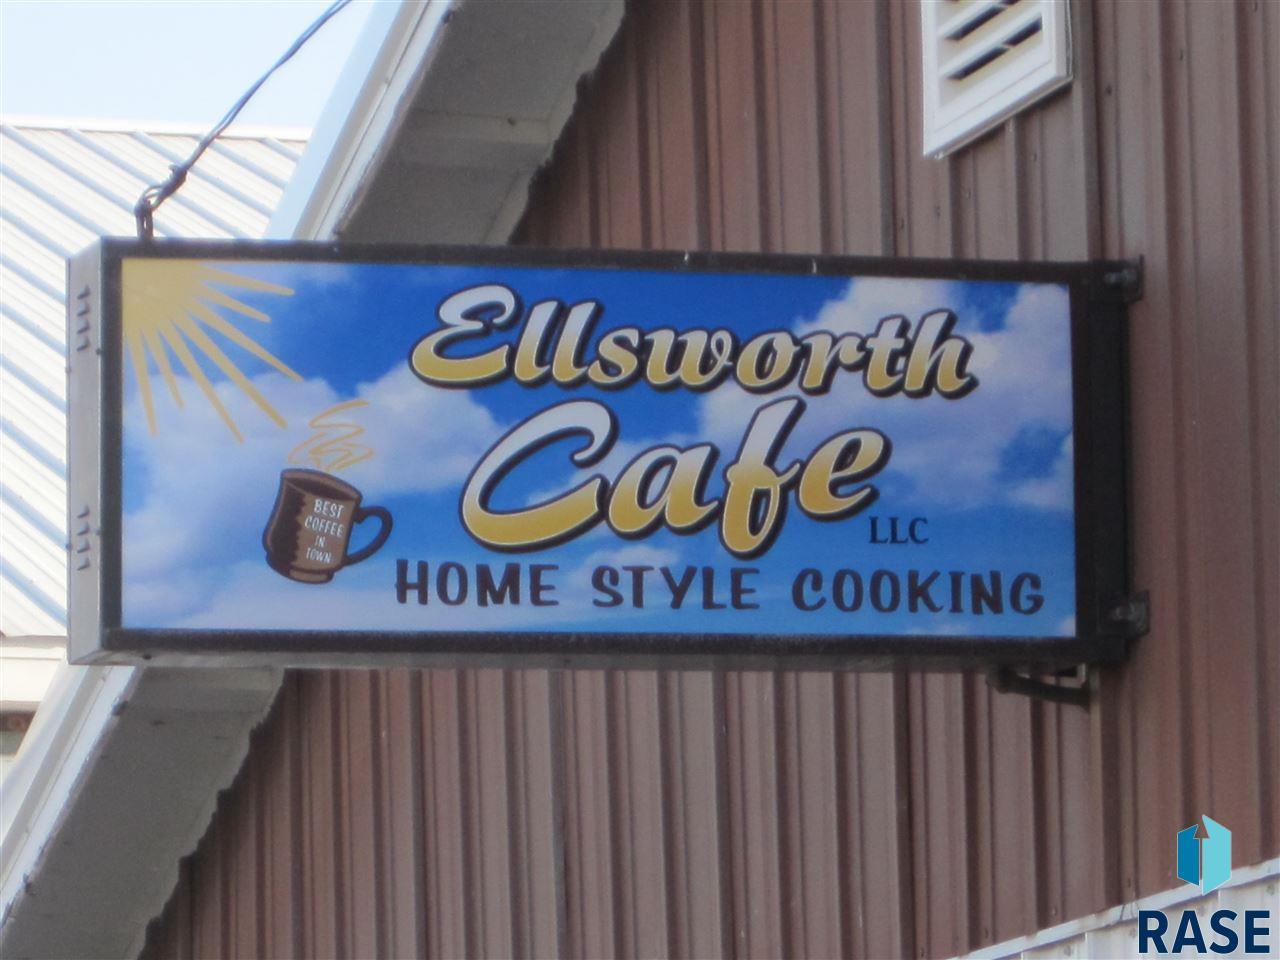 303 Broadway St, Ellsworth, MN 56129